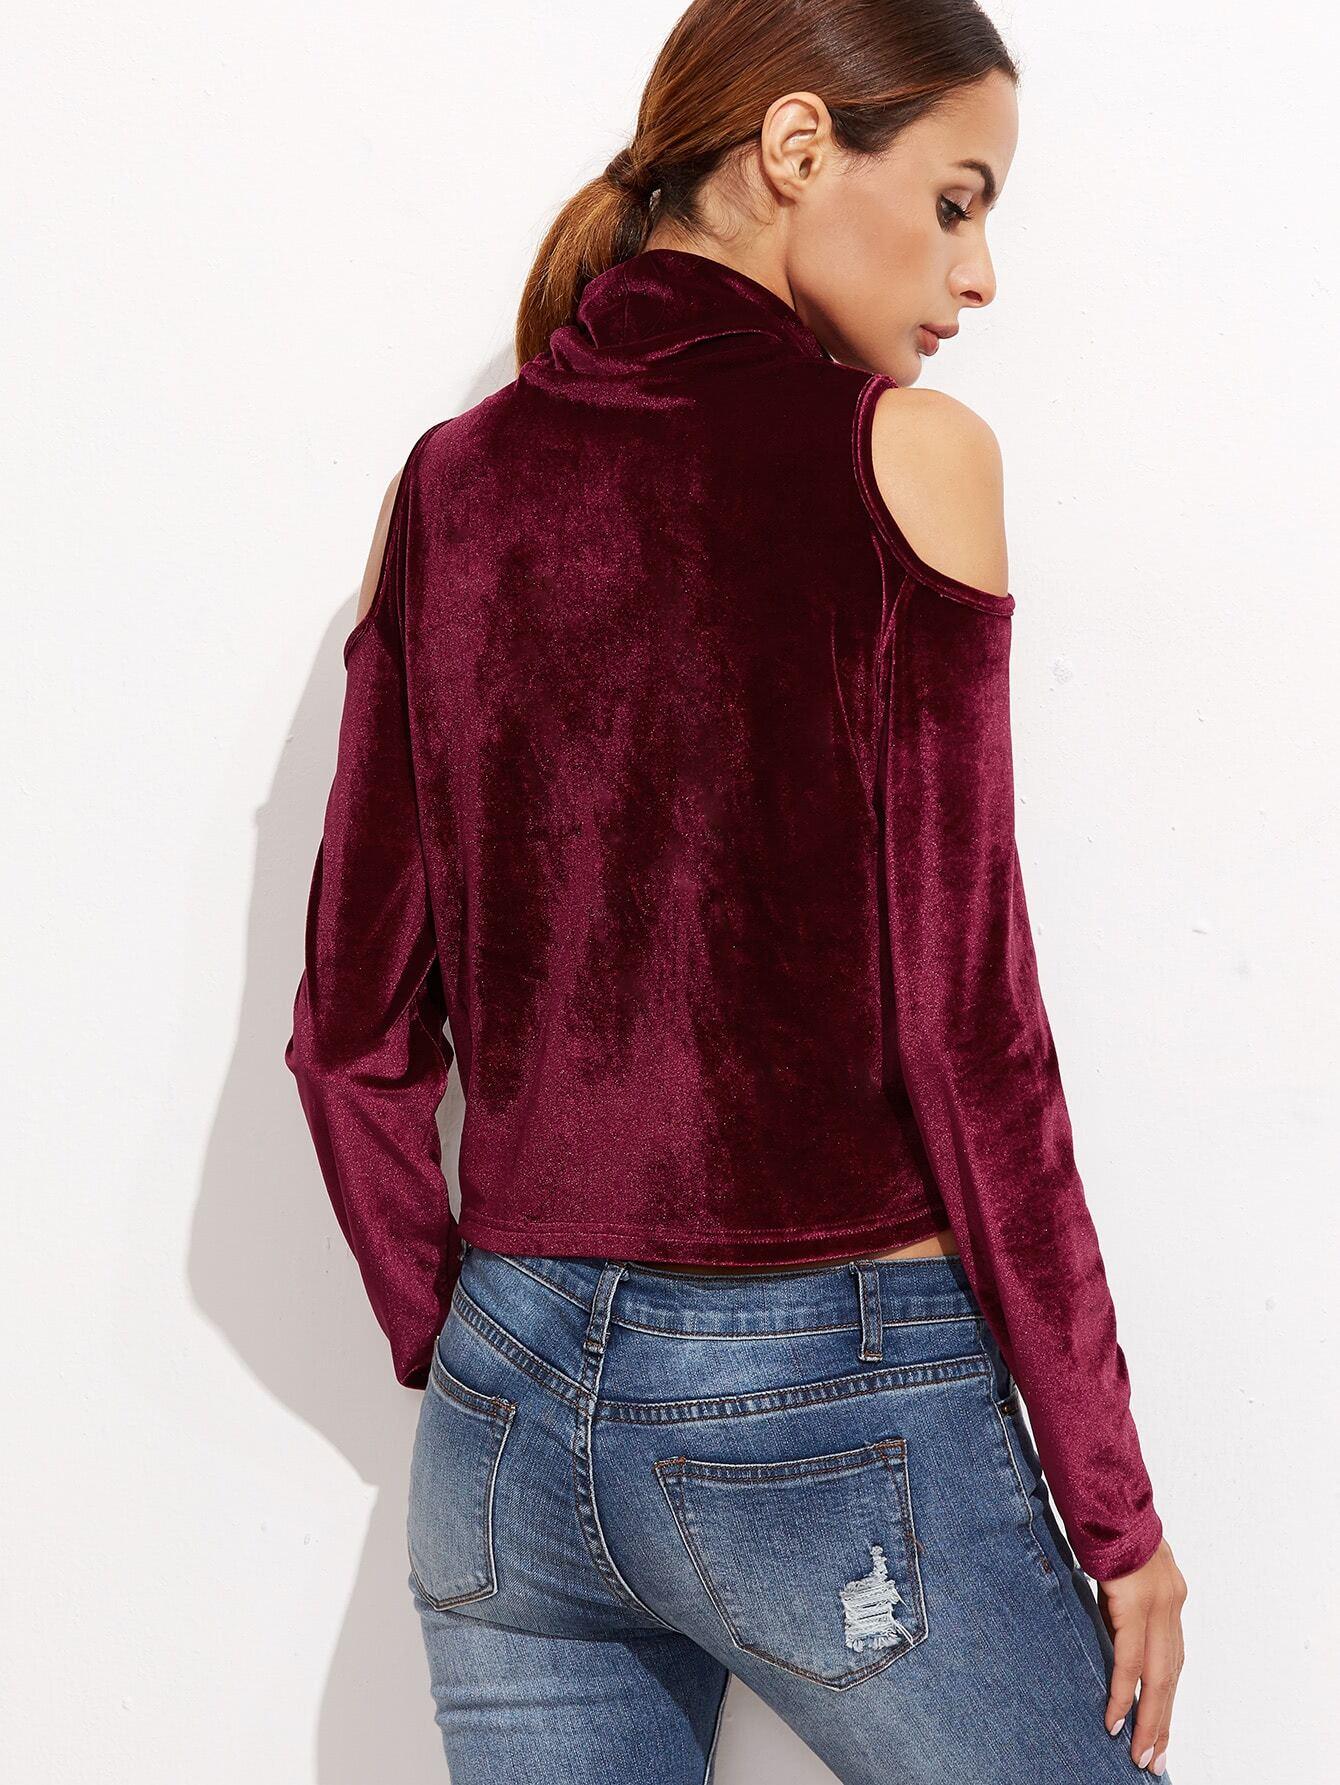 blouse161024714_2